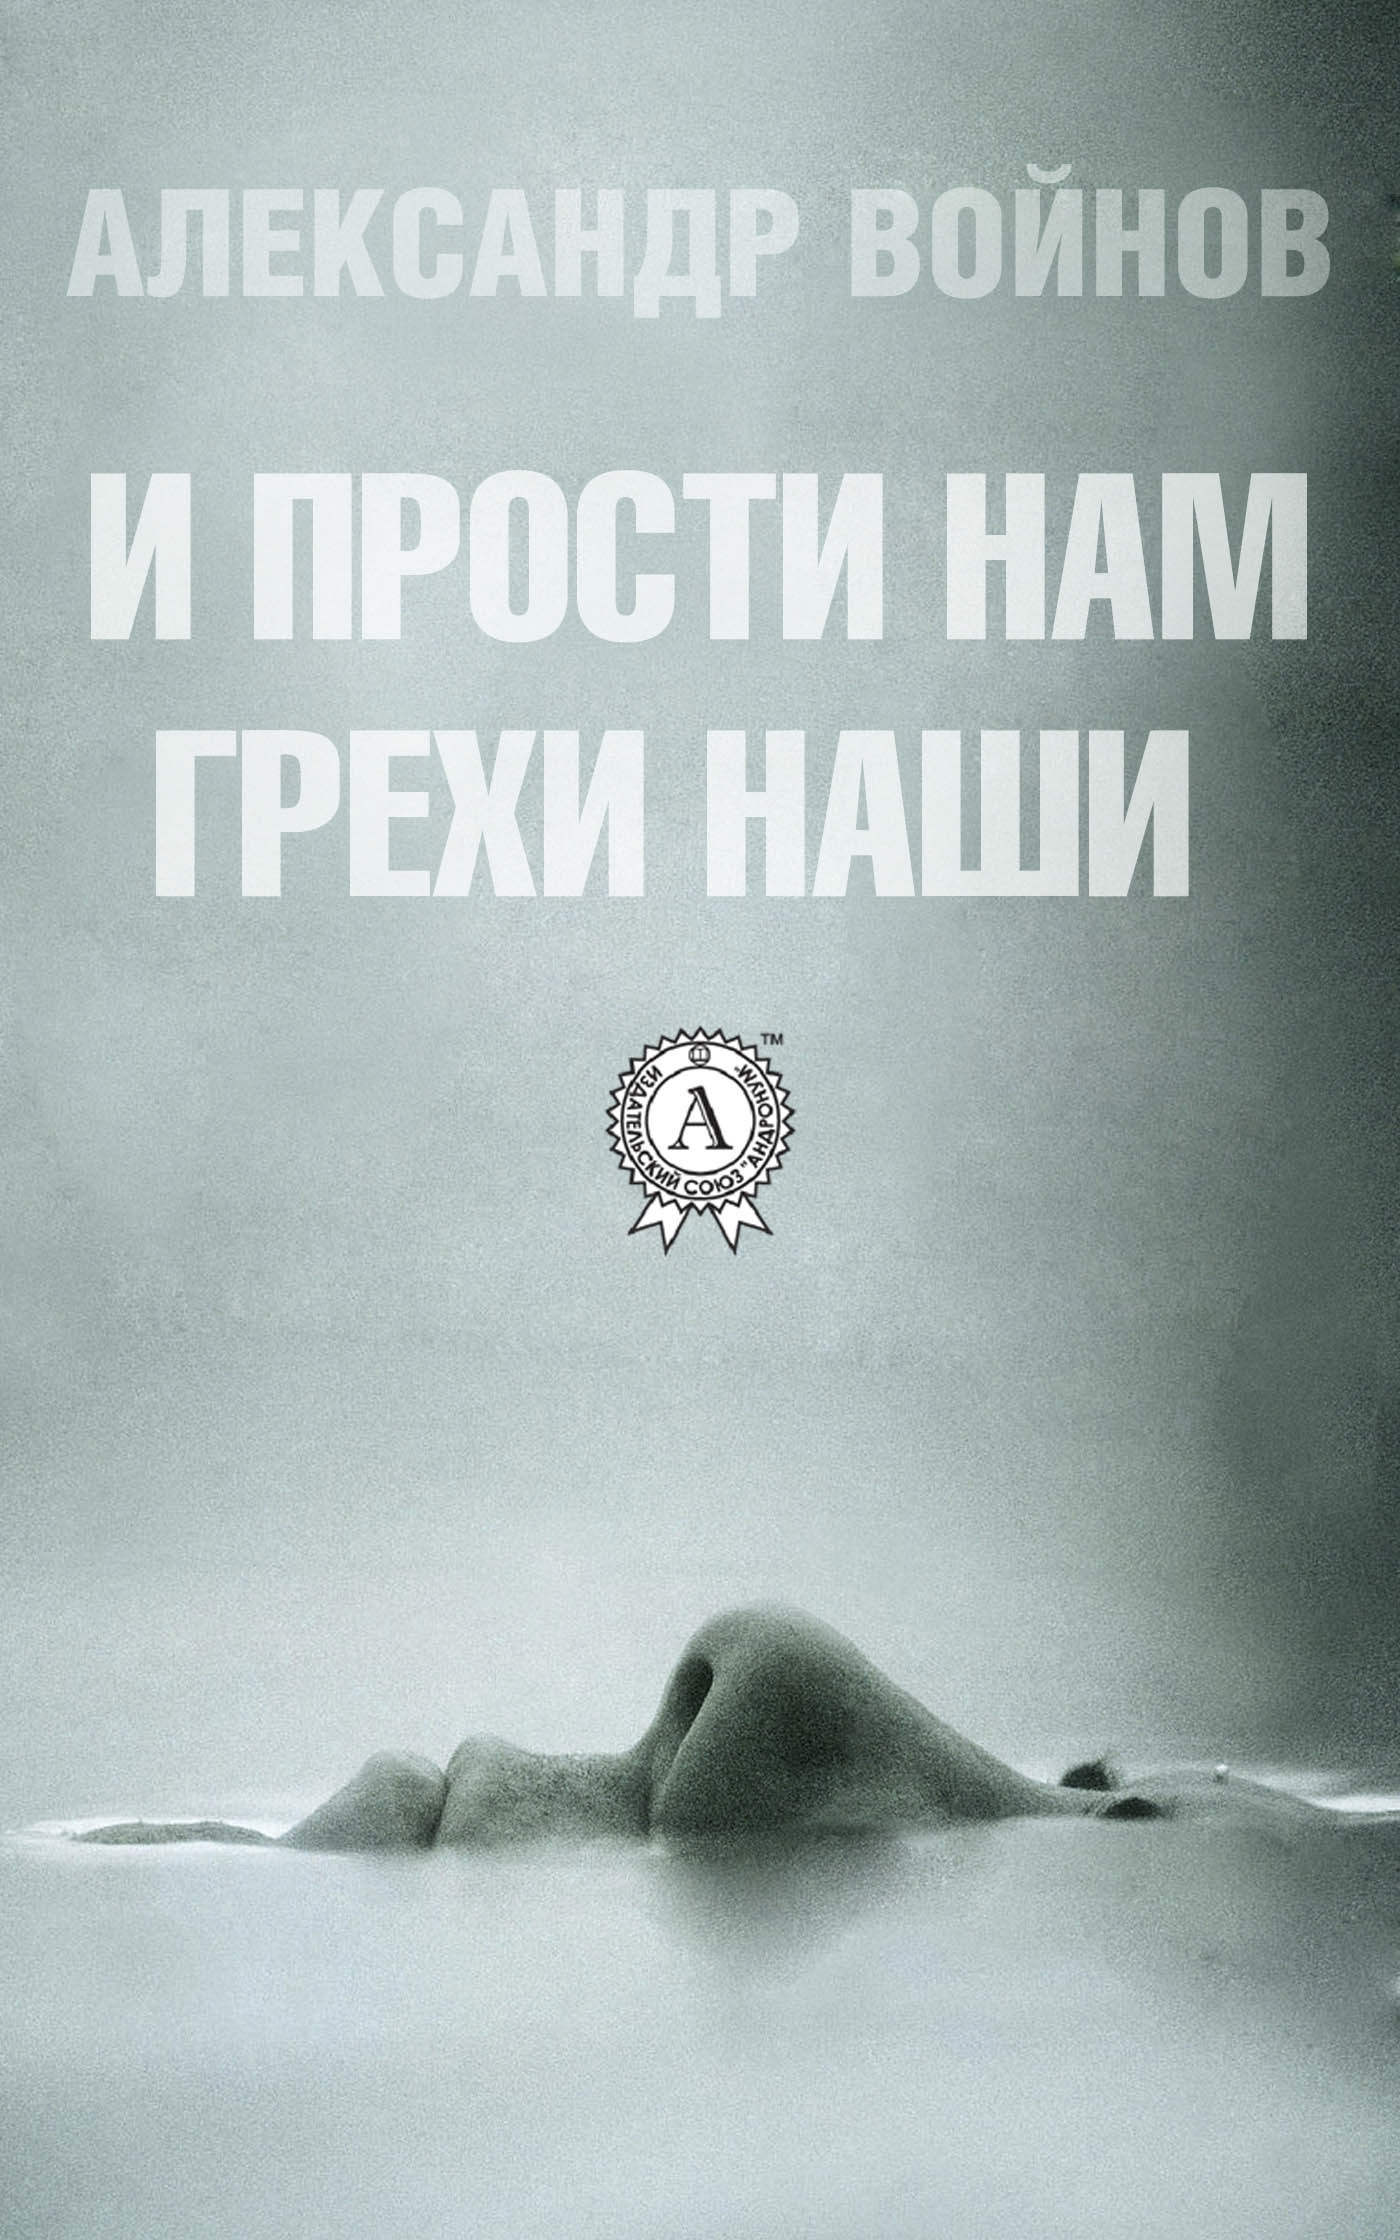 Александр Войнов И прости нам грехи наши грехи наши